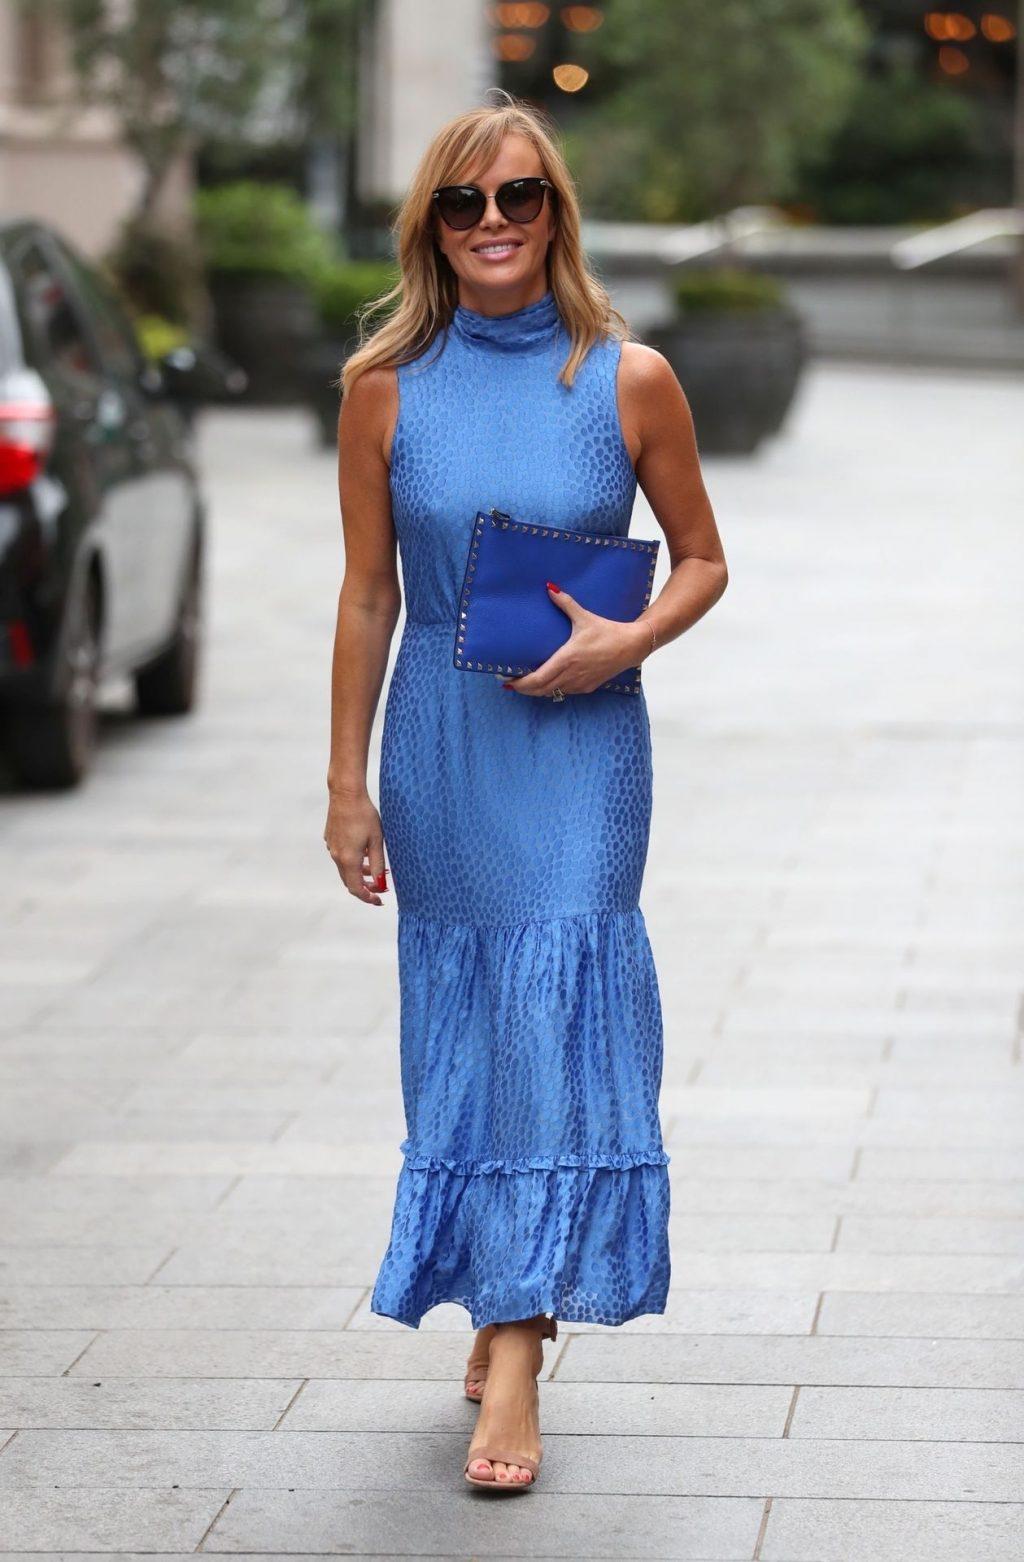 Amanda Holden Leaves Heart Breakfast Show Wearing A Blue Dress (70 Photos)